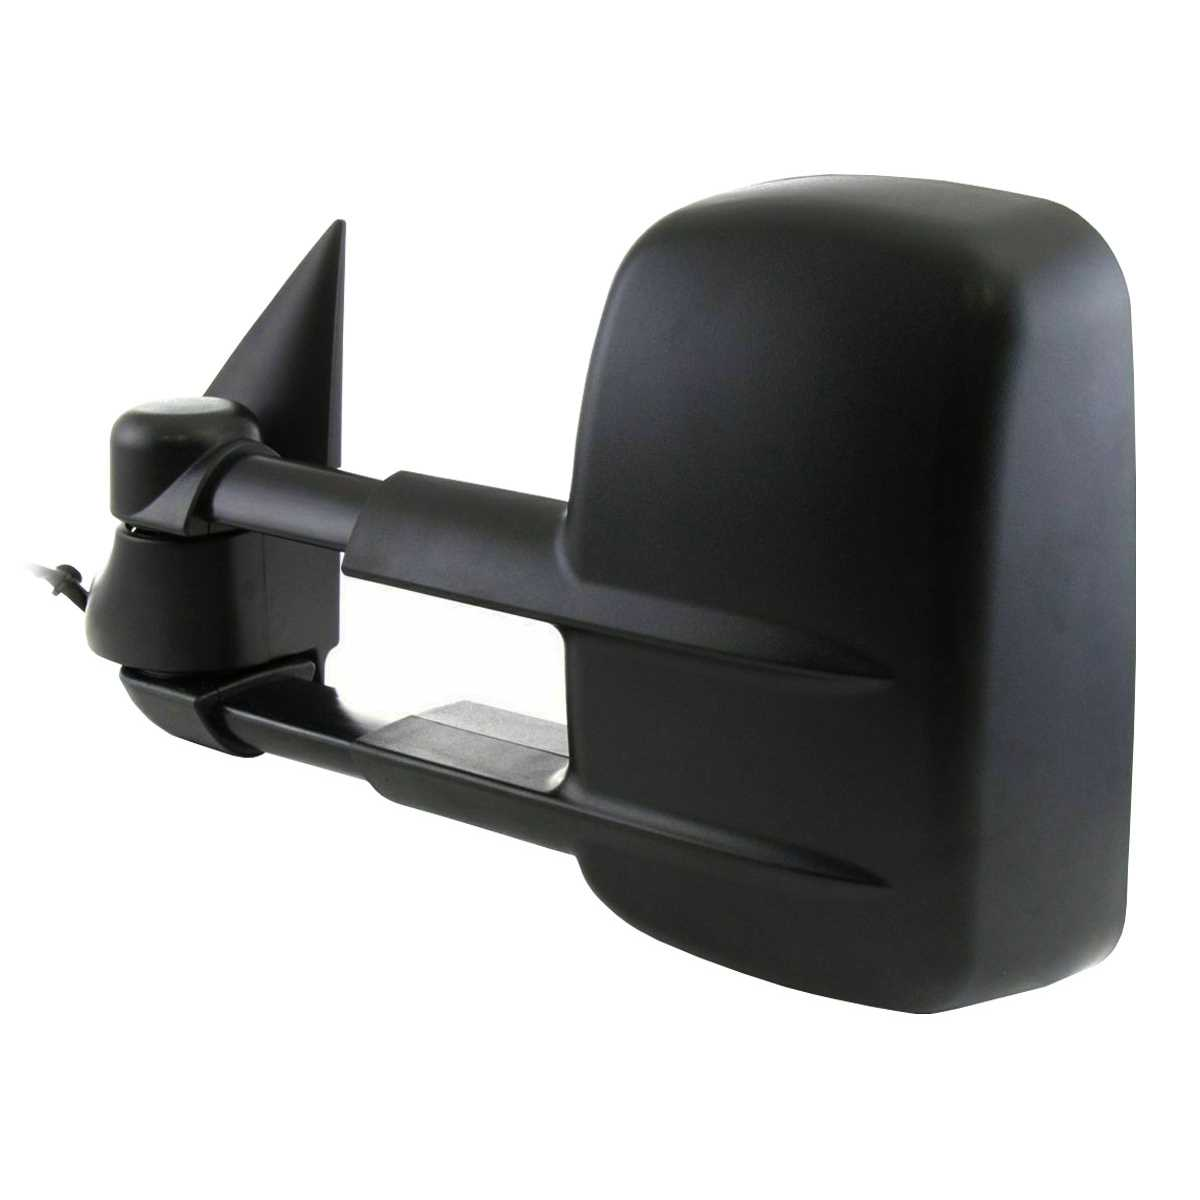 Pair-2-Power-Heated-Signal-Side-Mirror-Fits-2003-2006-Chevrolet-Silverado-1500 thumbnail 6